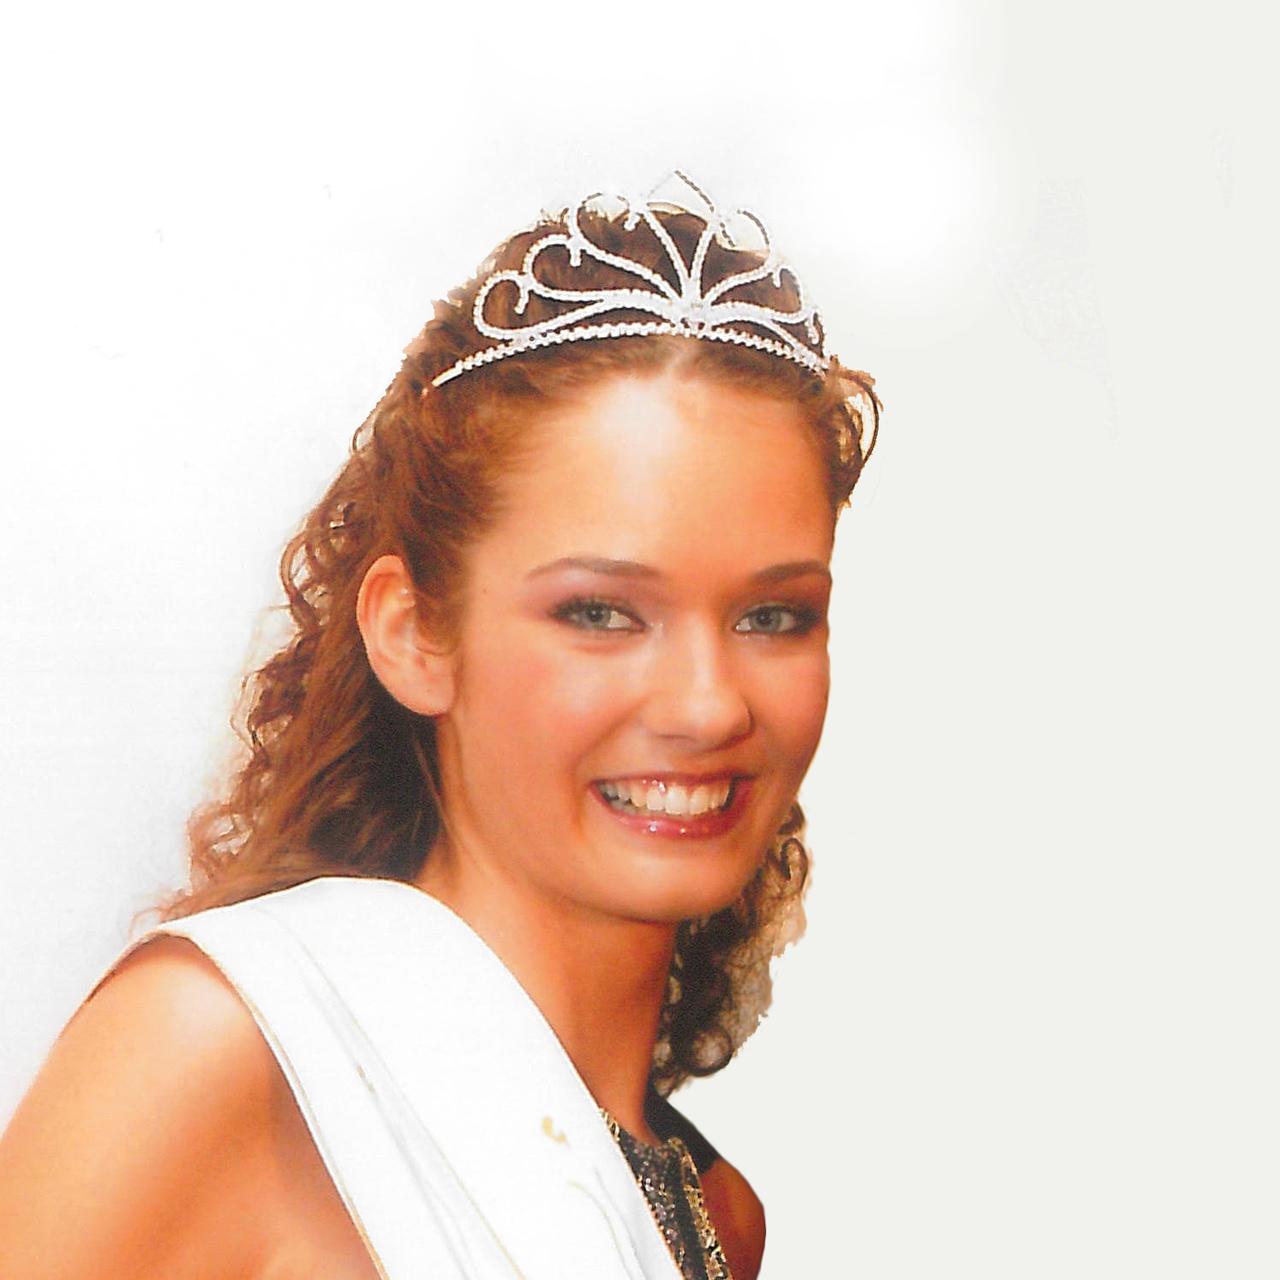 1-Vicemiss-2004-Tatiana-Krcmeryova